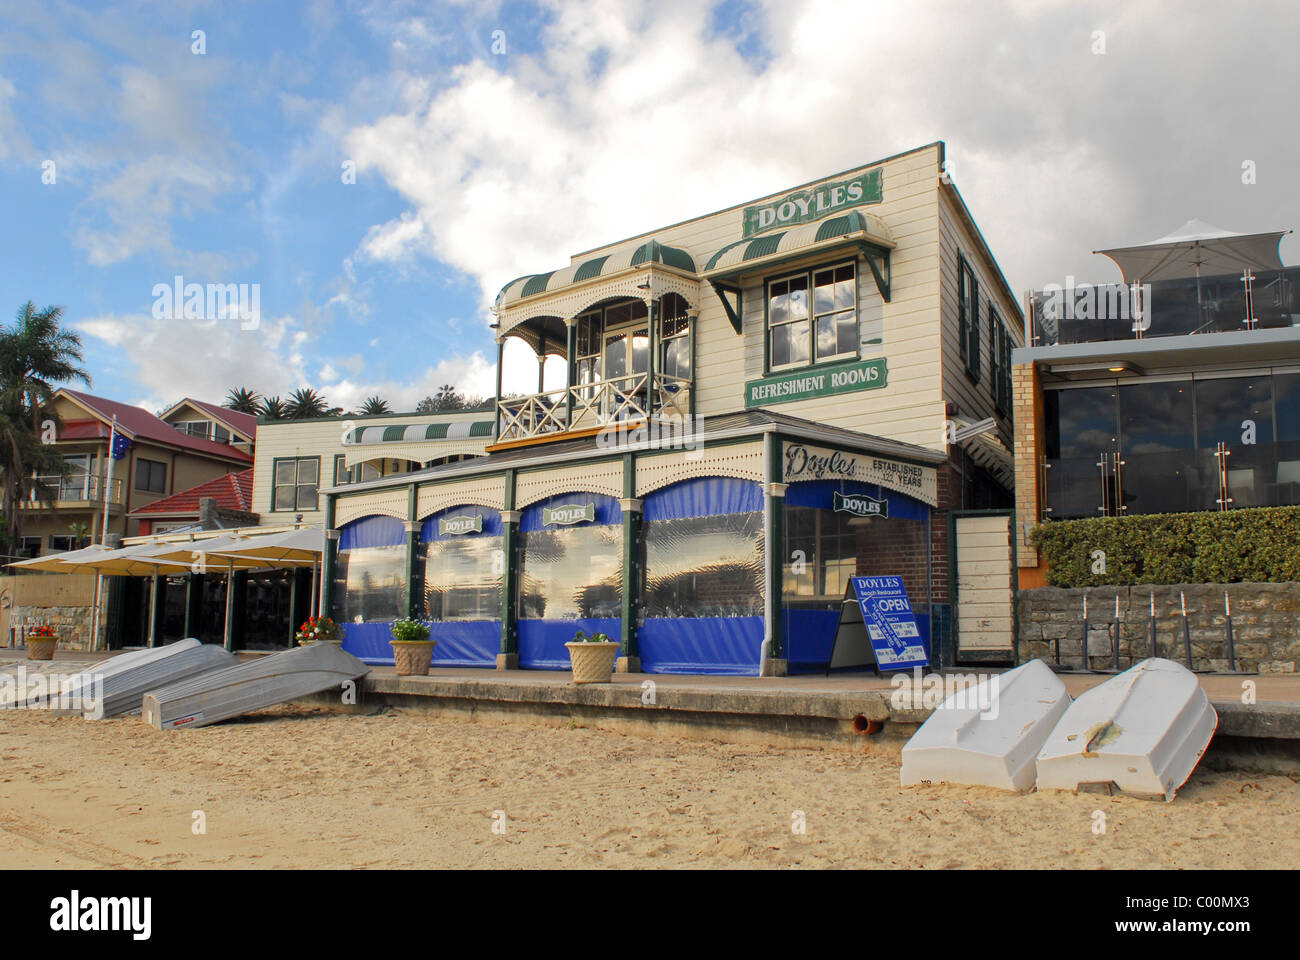 Doyles fish restaurant at Watsons Bay, Sydney. - Stock Image